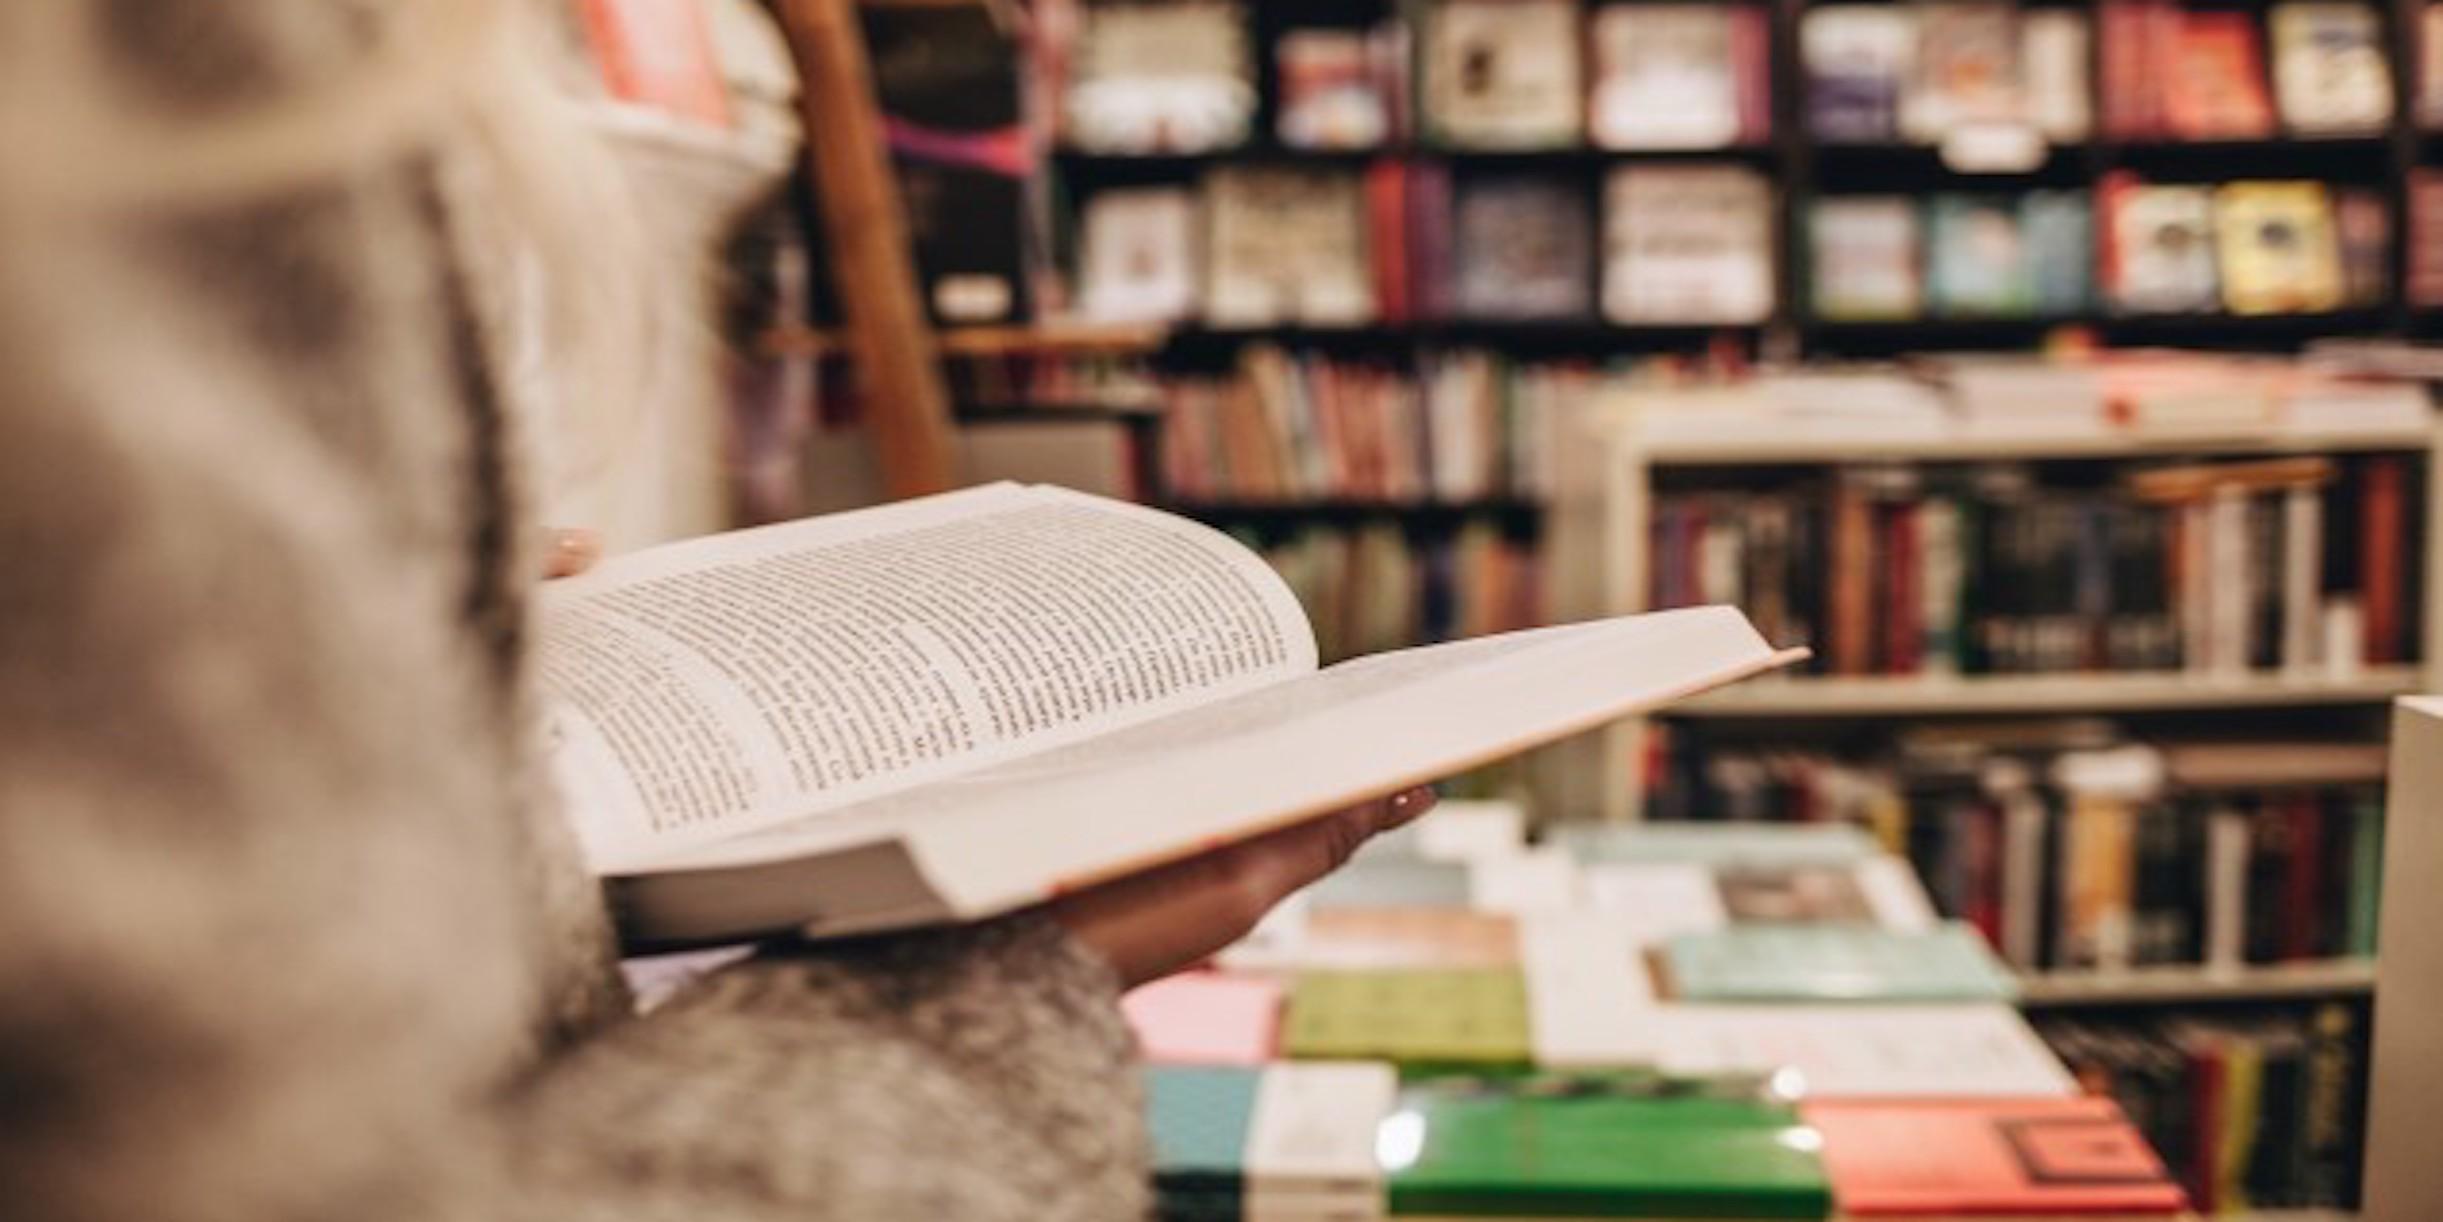 Lesung organisieren